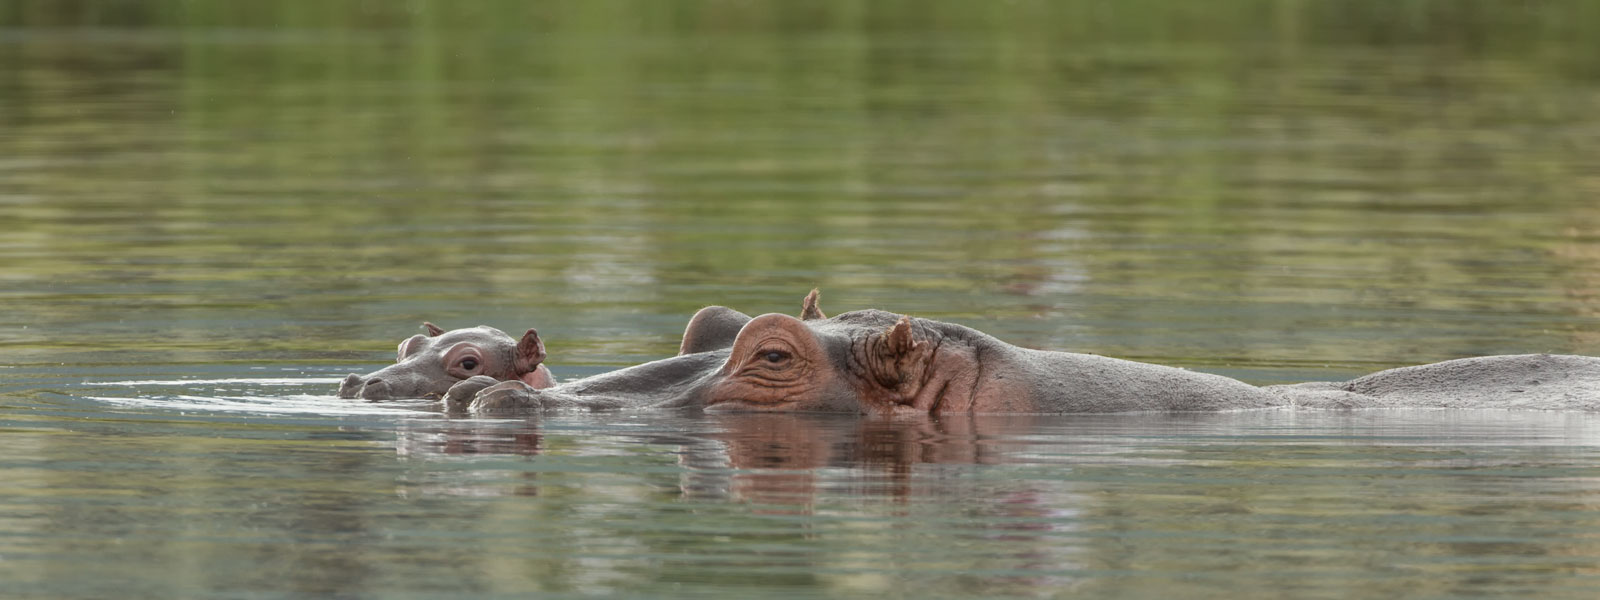 Hippo-1600-x-600-copy